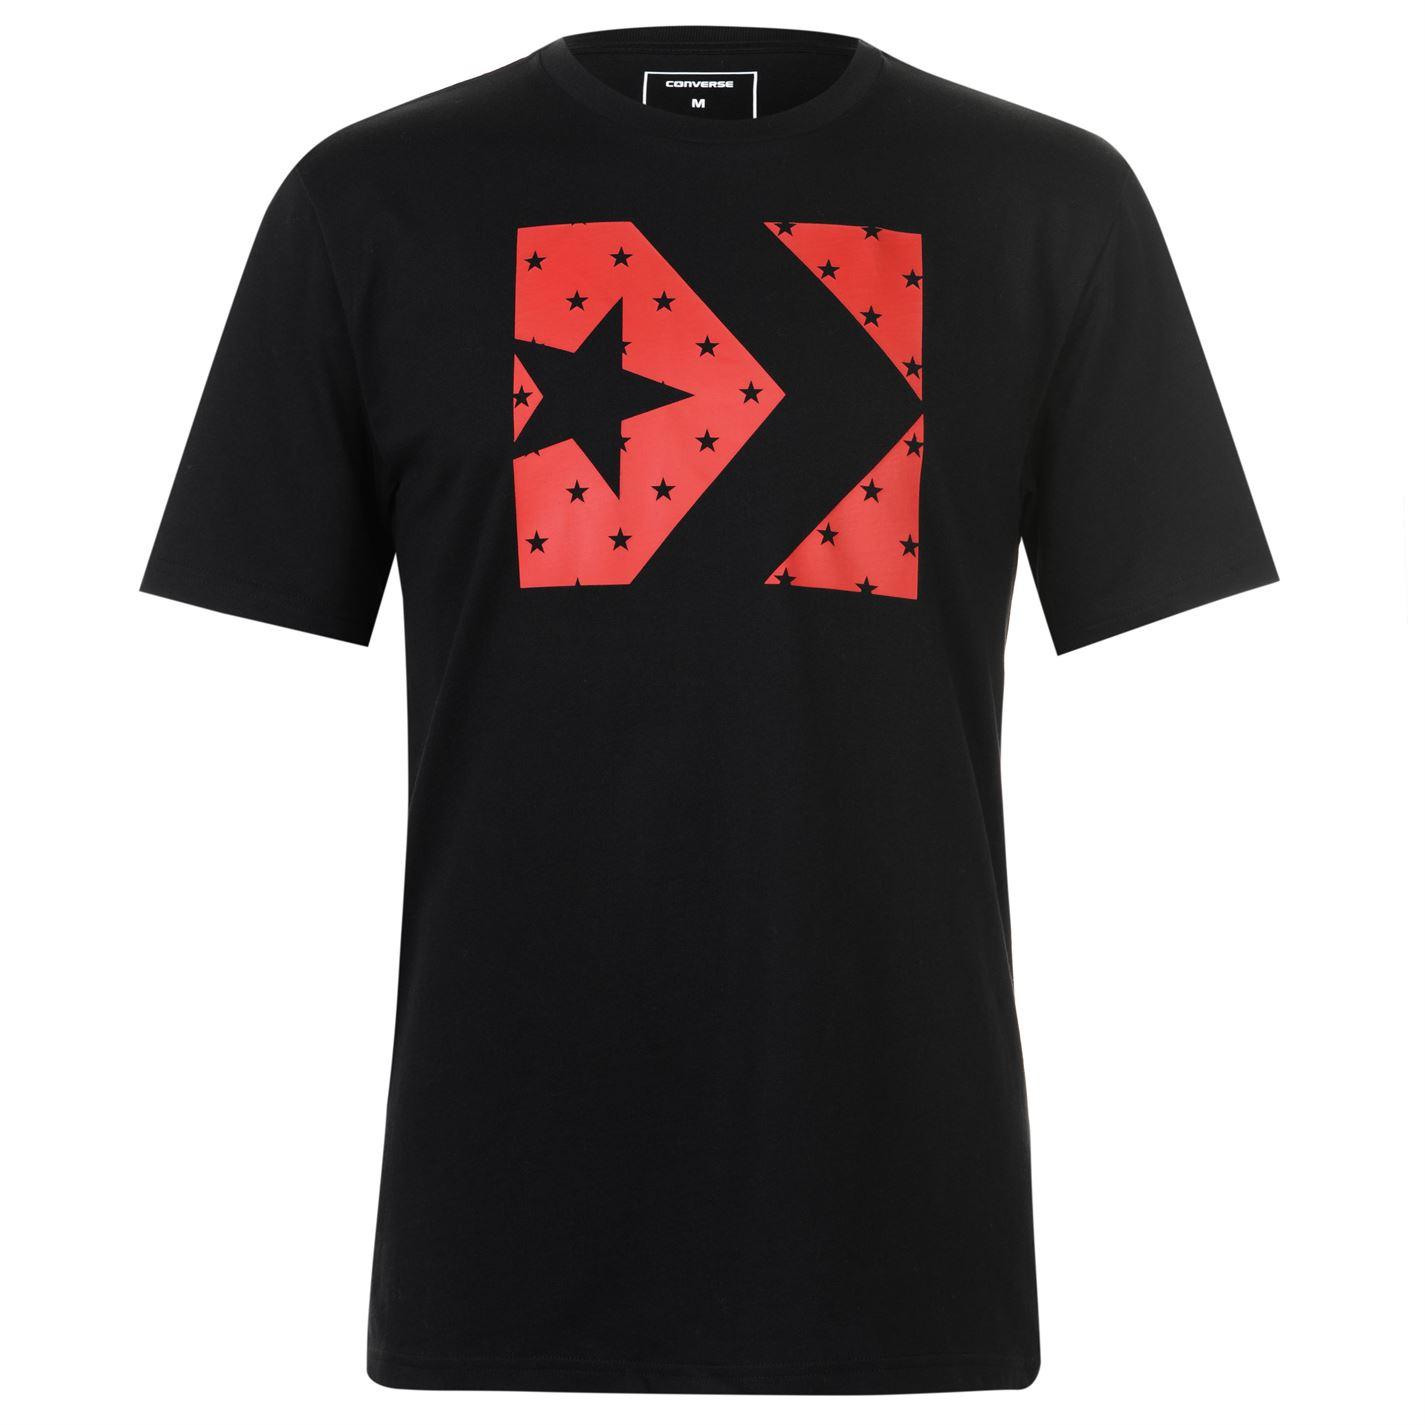 496dca7c183 Converse pletený tričko